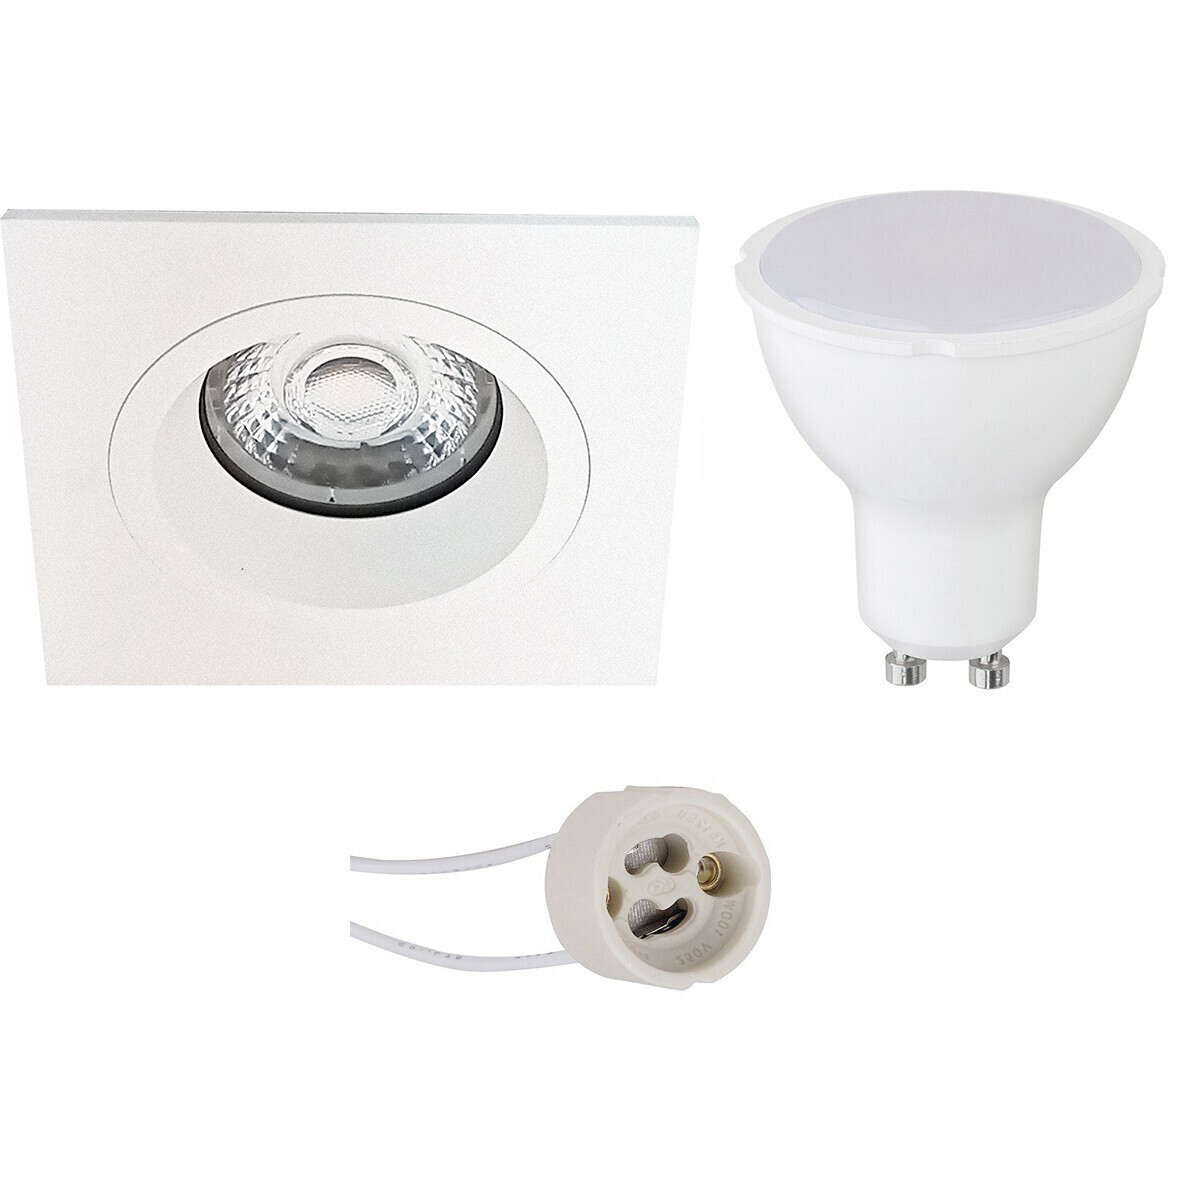 LED Spot Set - Pragmi Rodos Pro - GU10 Fitting - Inbouw Vierkant - Mat Wit - 8W - Natuurlijk Wit 420